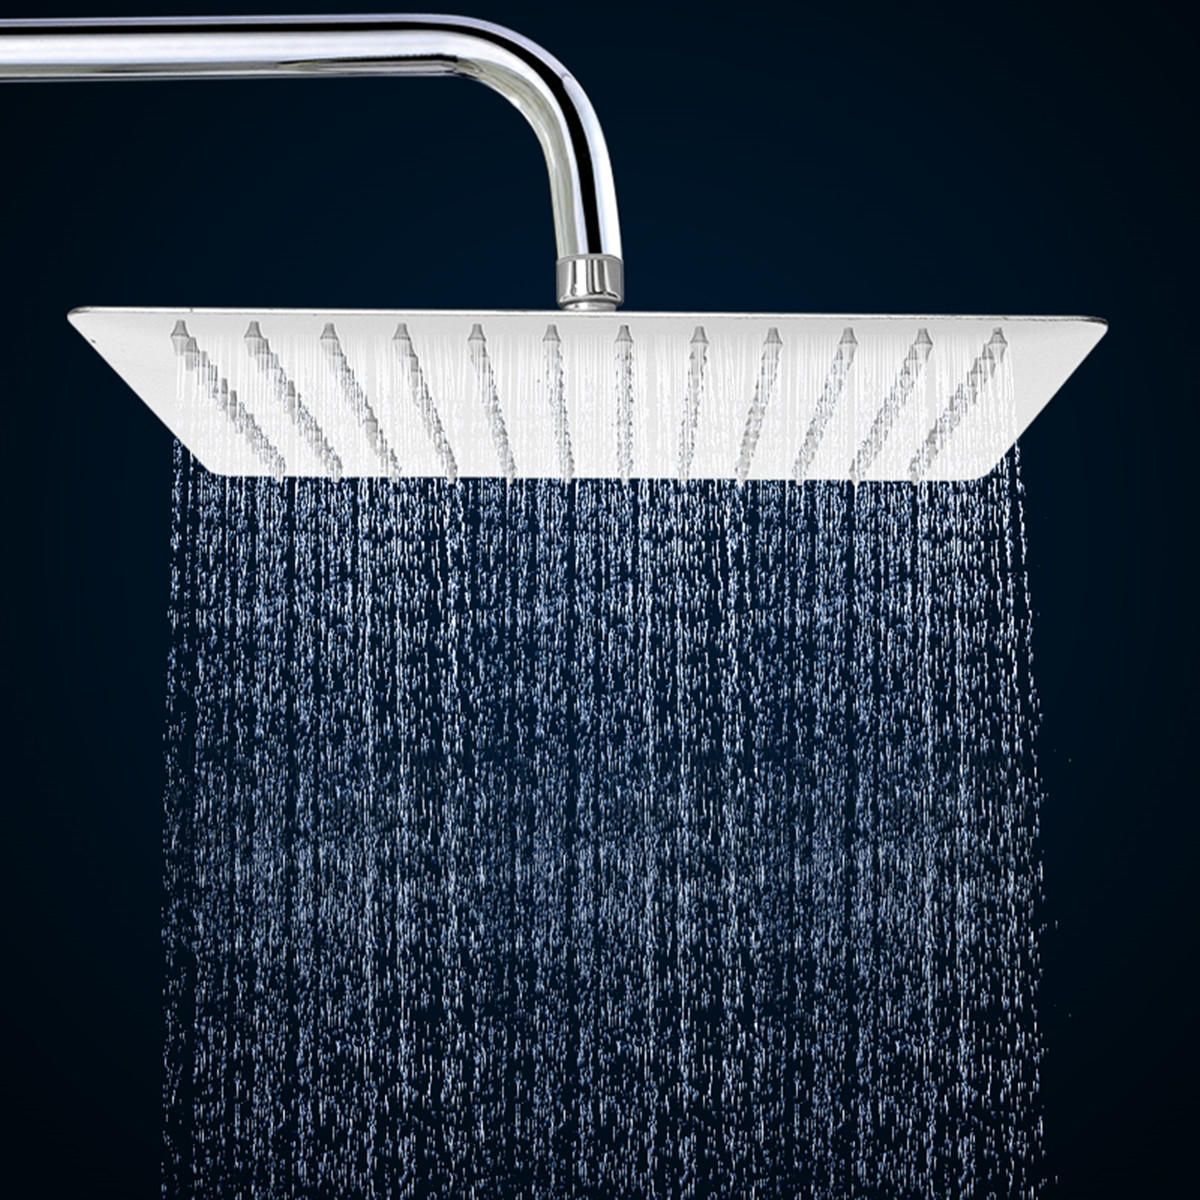 New 360° 12 inch Square Stainless Steel Rain Shower Head Rainfall Bathroom Top Sprayer Chrome For Bath bthroom shower Ul tra Thin